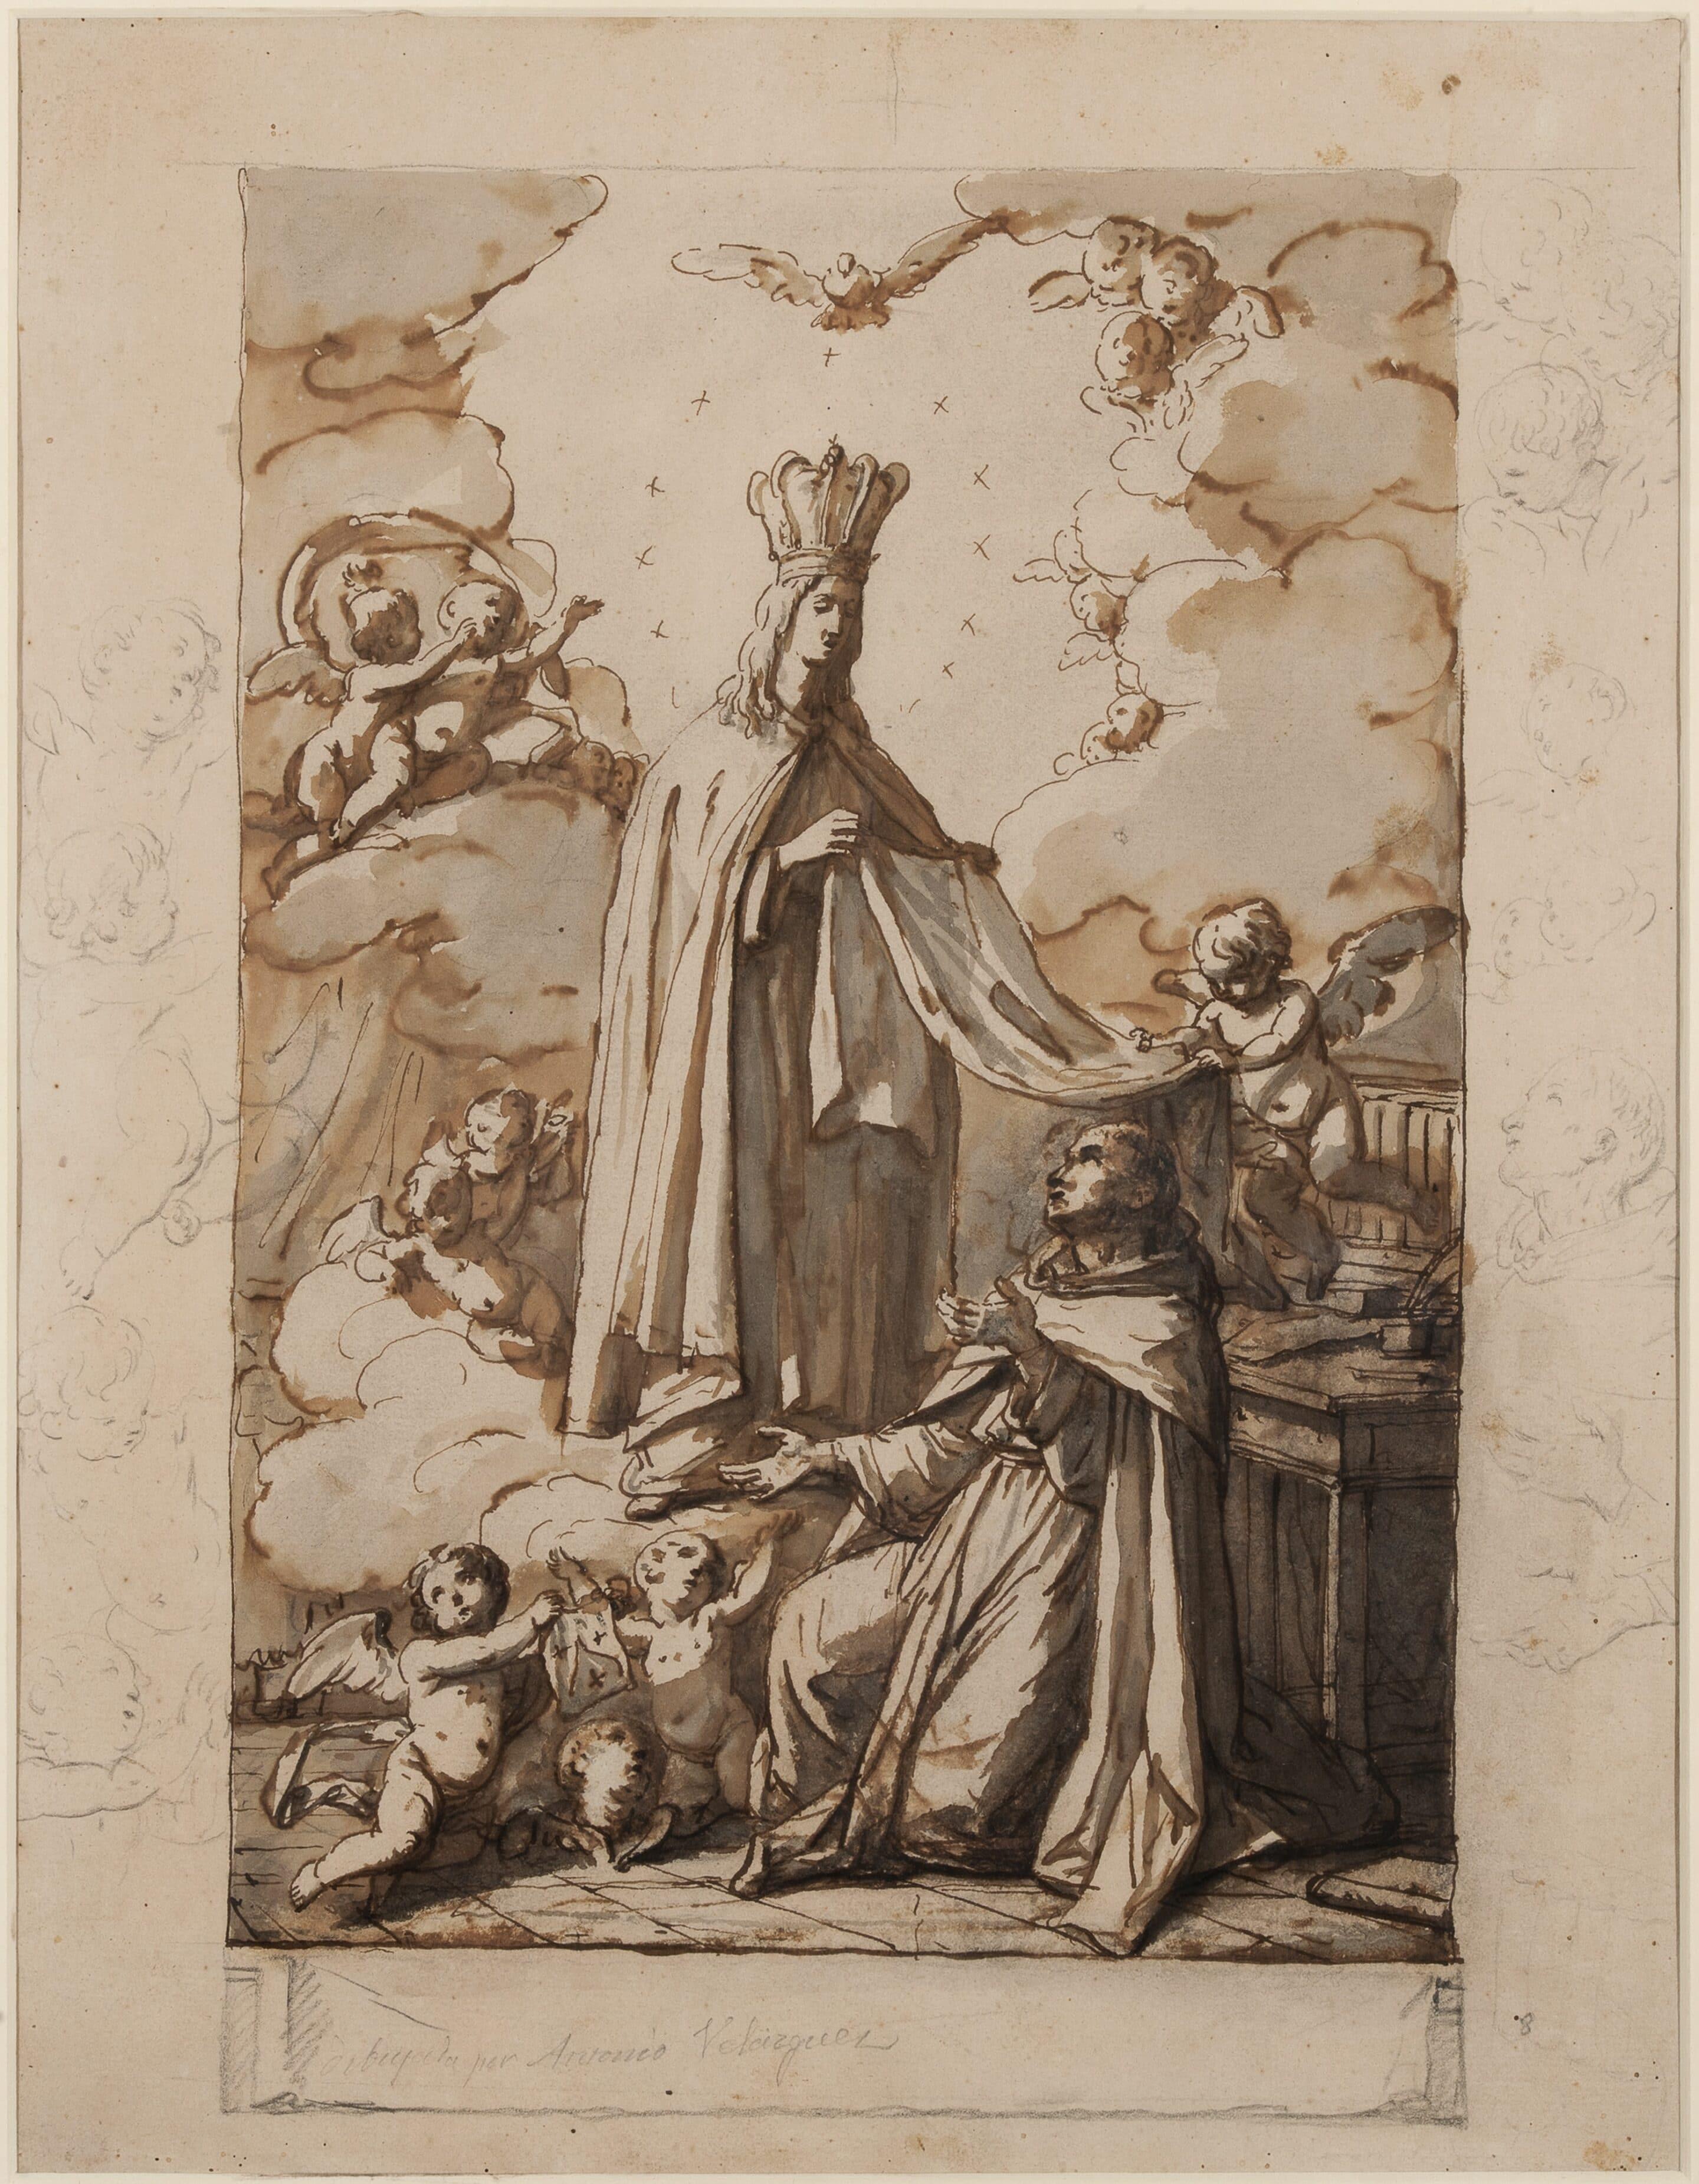 Flos Carmeli. The Apparition of the Carmelite Virgin to Saint Simon Stock - Antonio González Velázquez